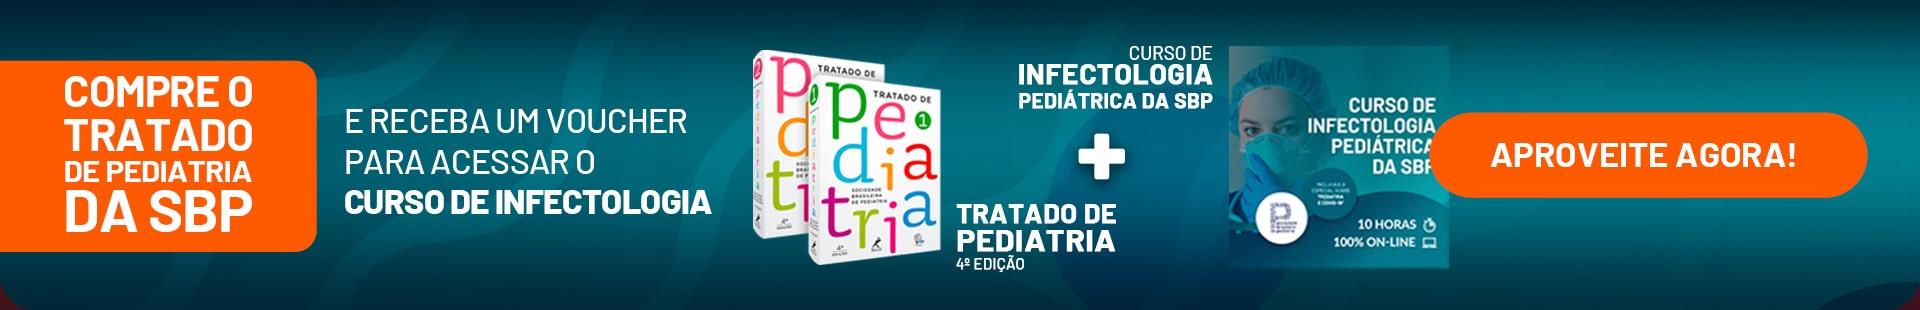 Tratado de Pediatria: 2 volumes